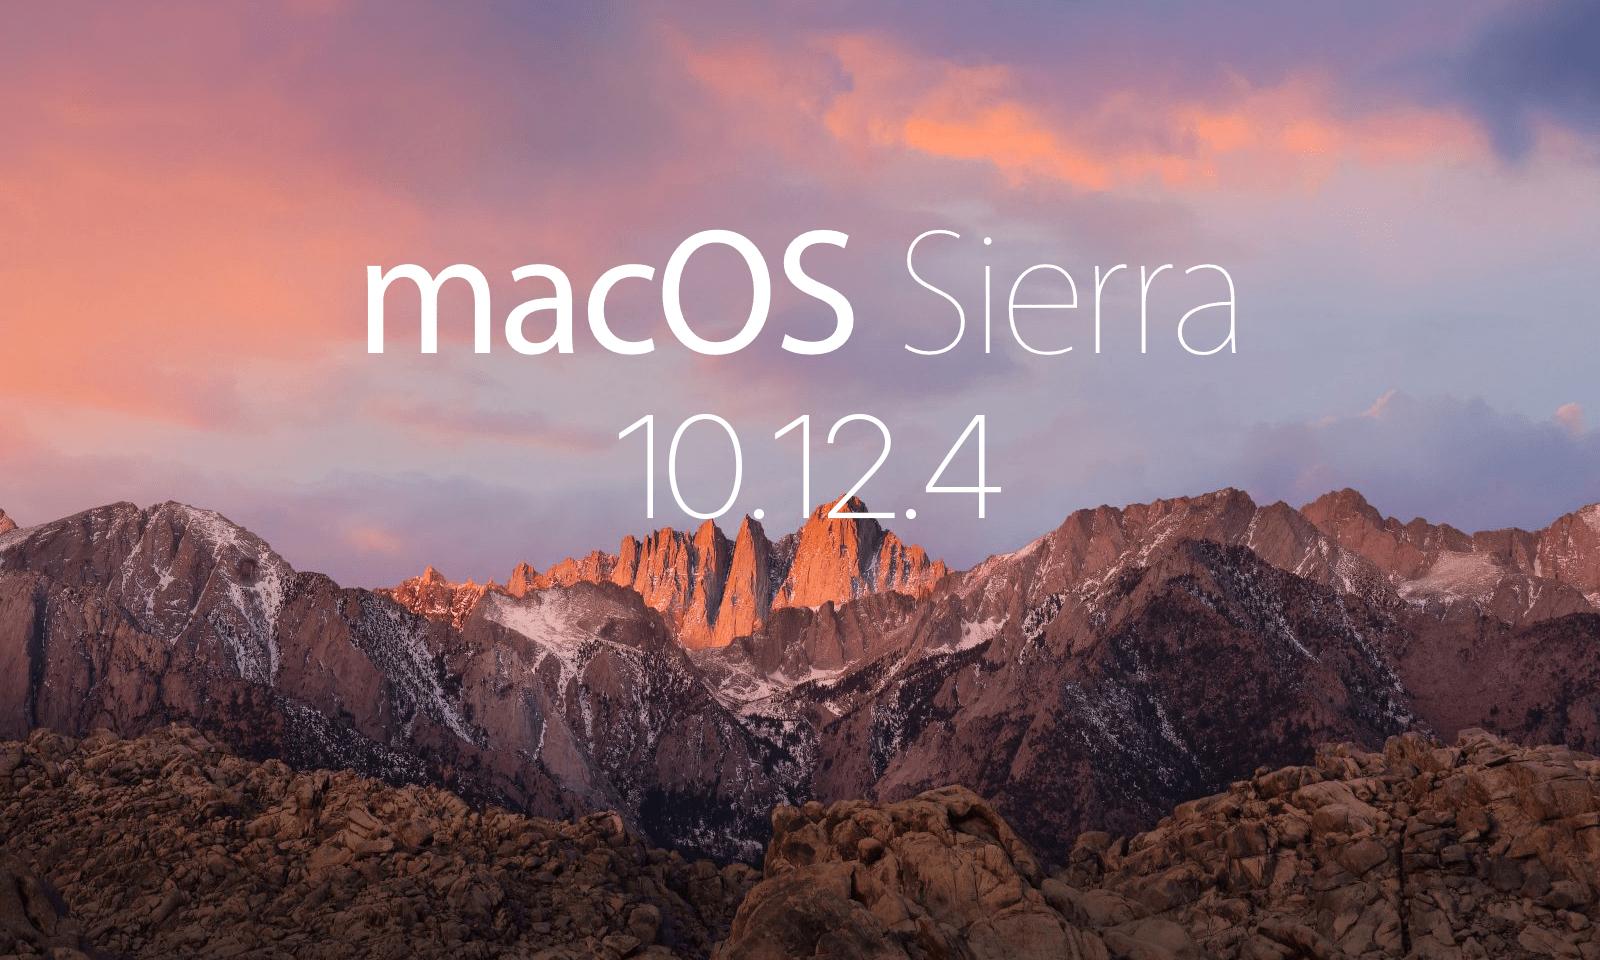 Night Shift 모드 탑재 – macOS Sierra 10.12.4 업데이트